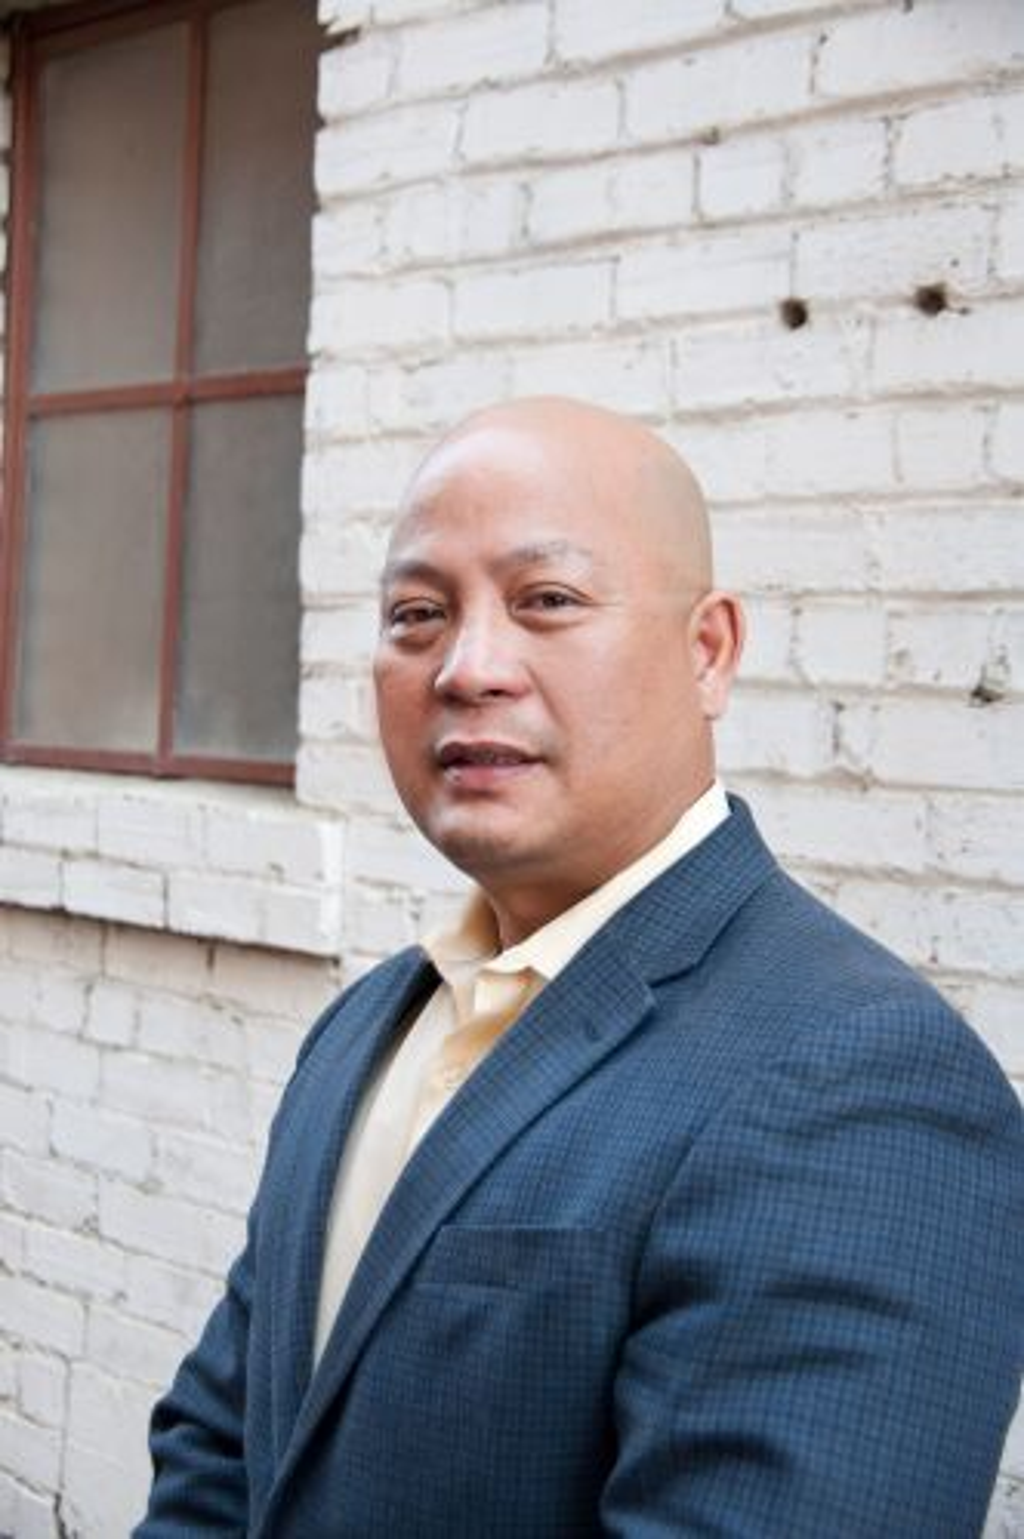 Arnel V Padilla agent image